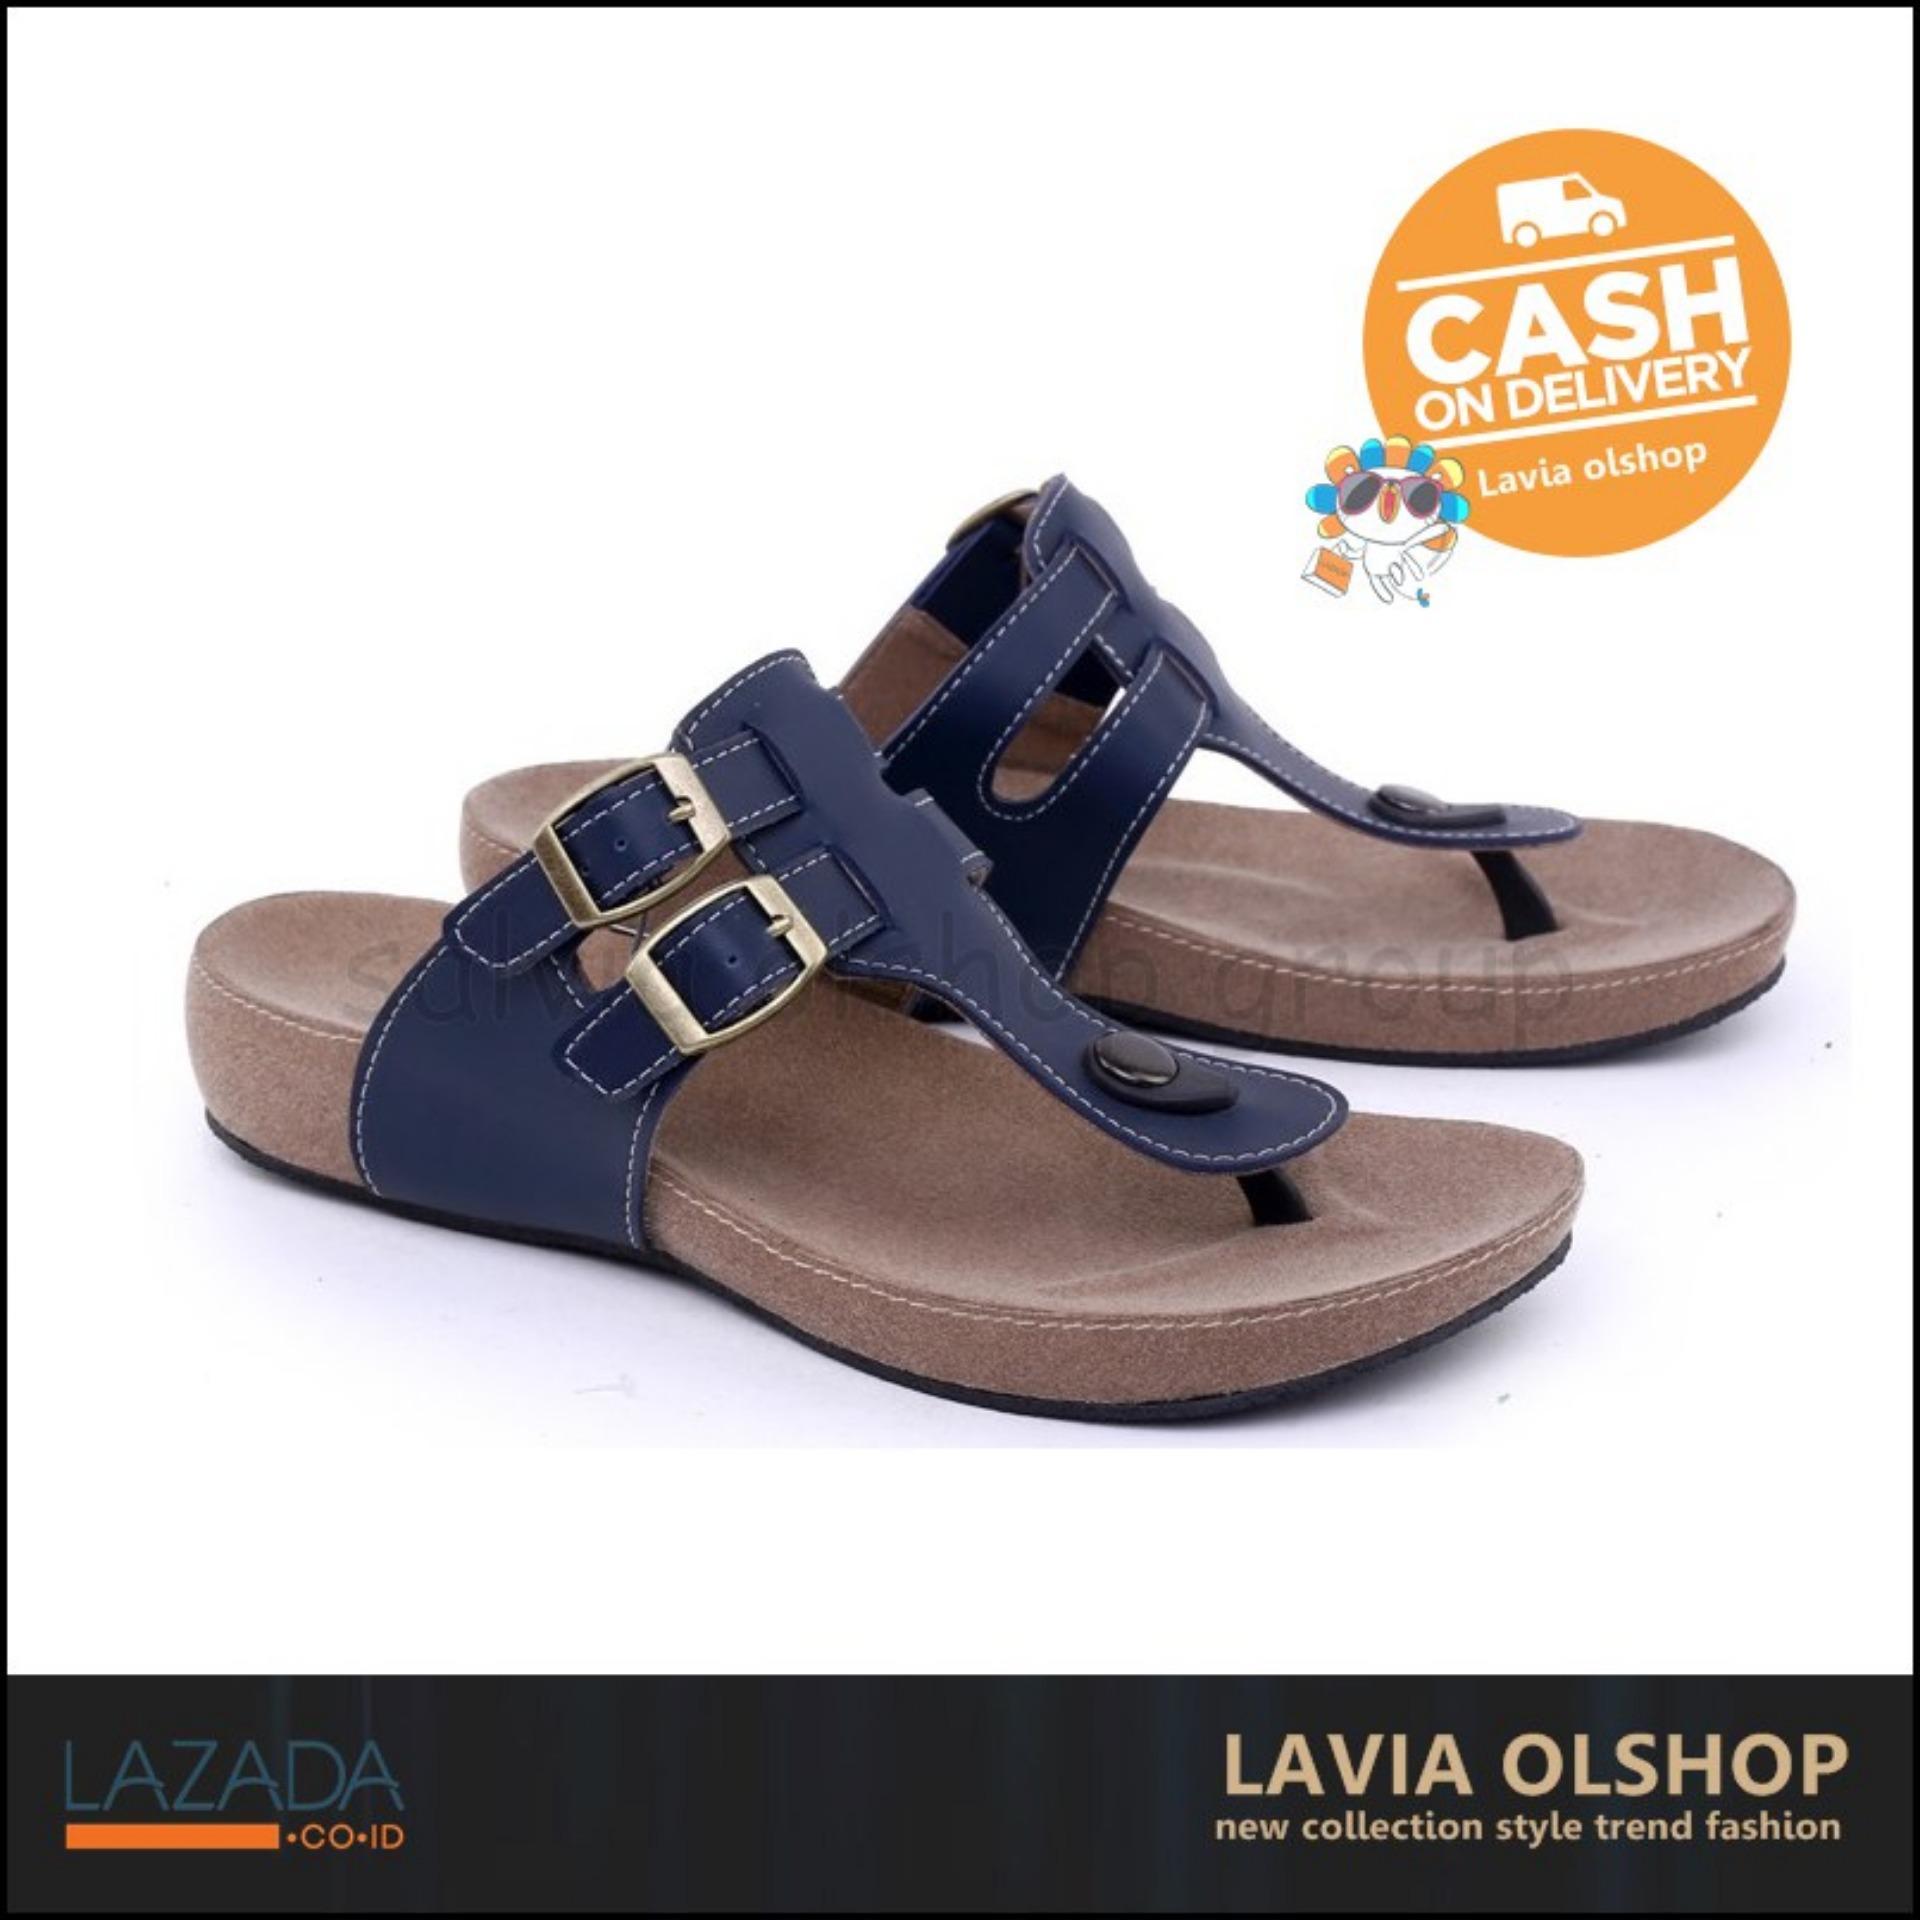 Shoes Sandal Flat Wanita Lucu Dan Modis Model Terbaru GDE 8581 - Biru